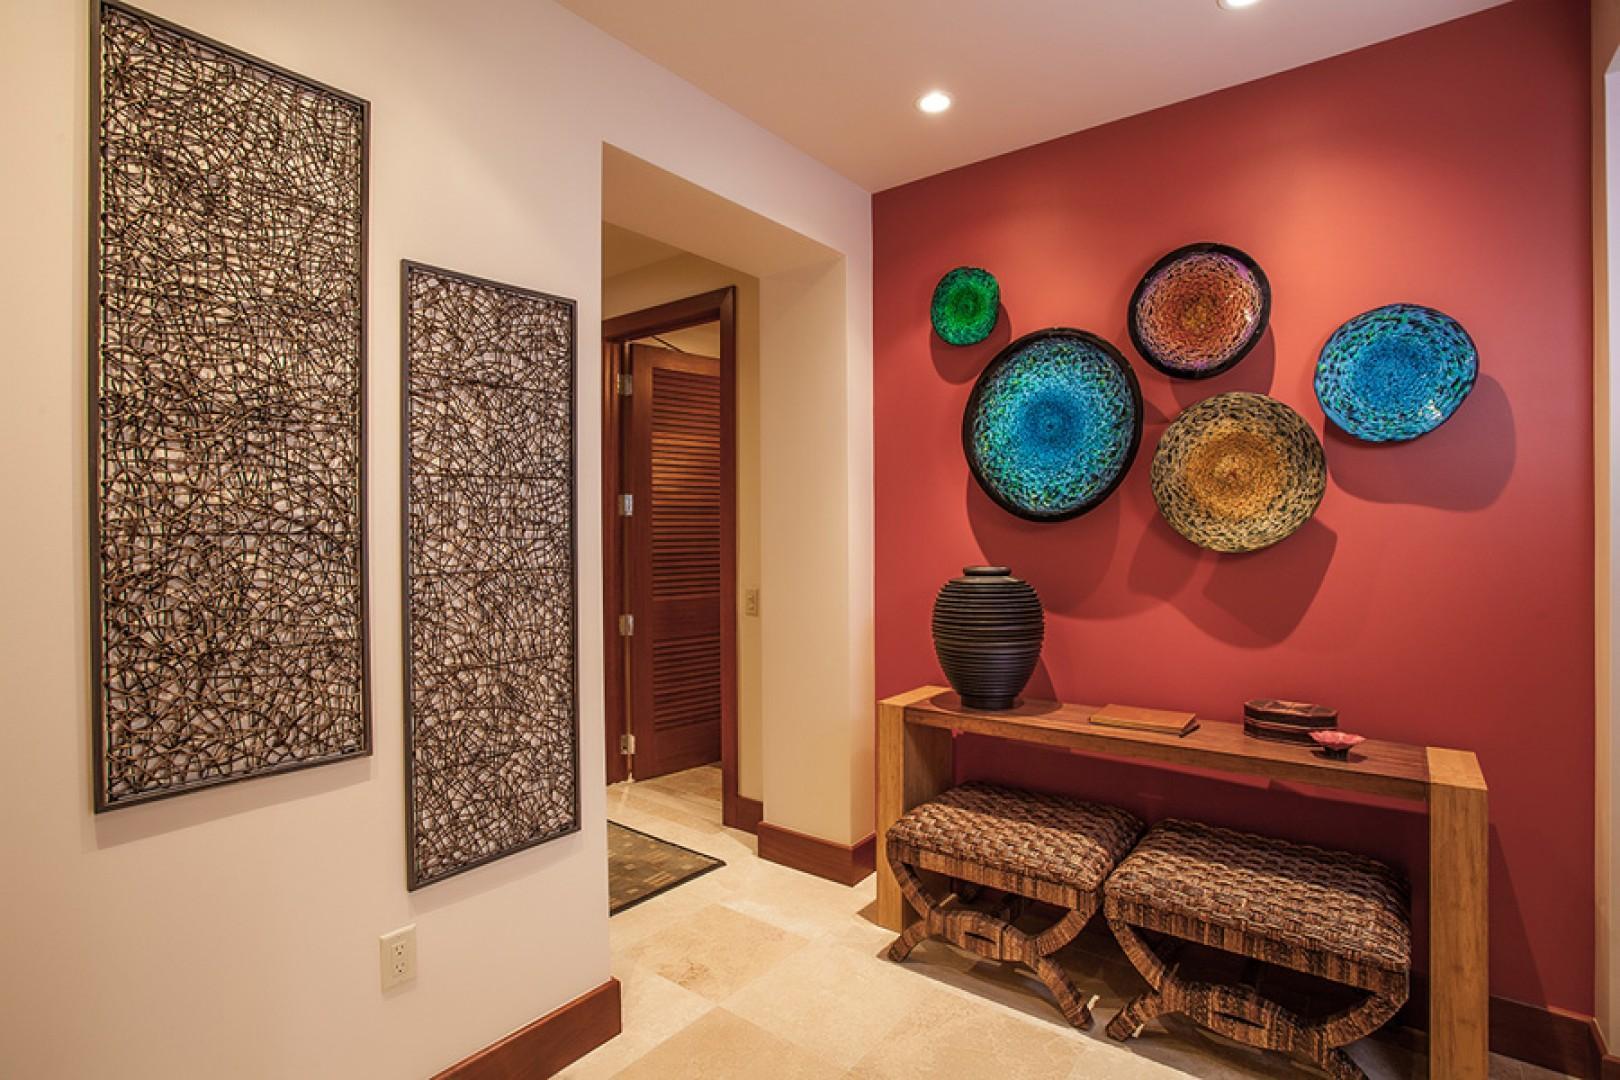 Enter The Resplendent C301 Sun Splash Villa with Exquisite Art and Decor!